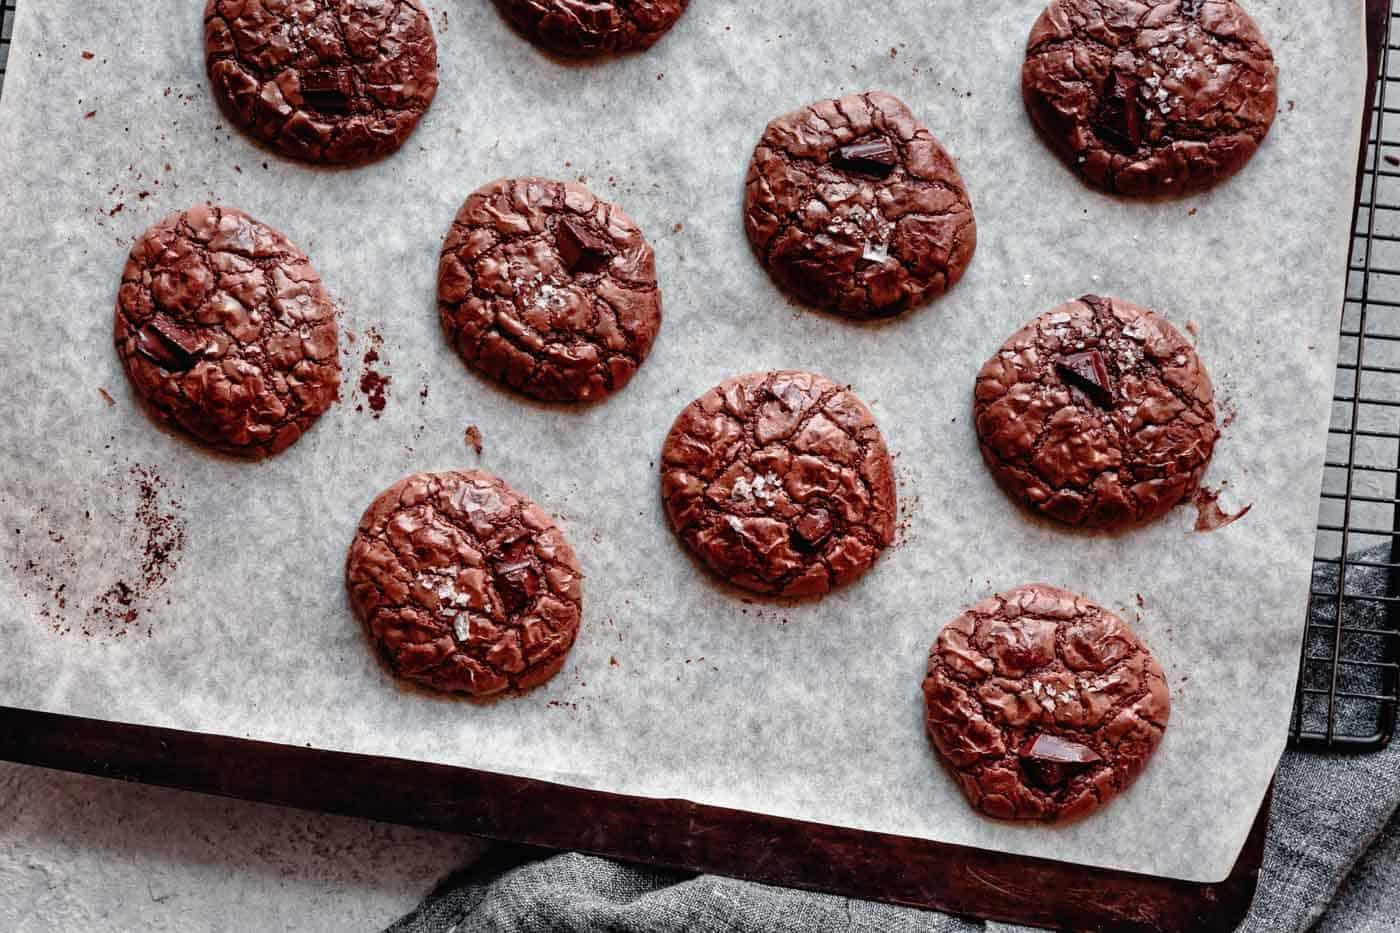 chocolate cookies for choc on choc cheeseboard